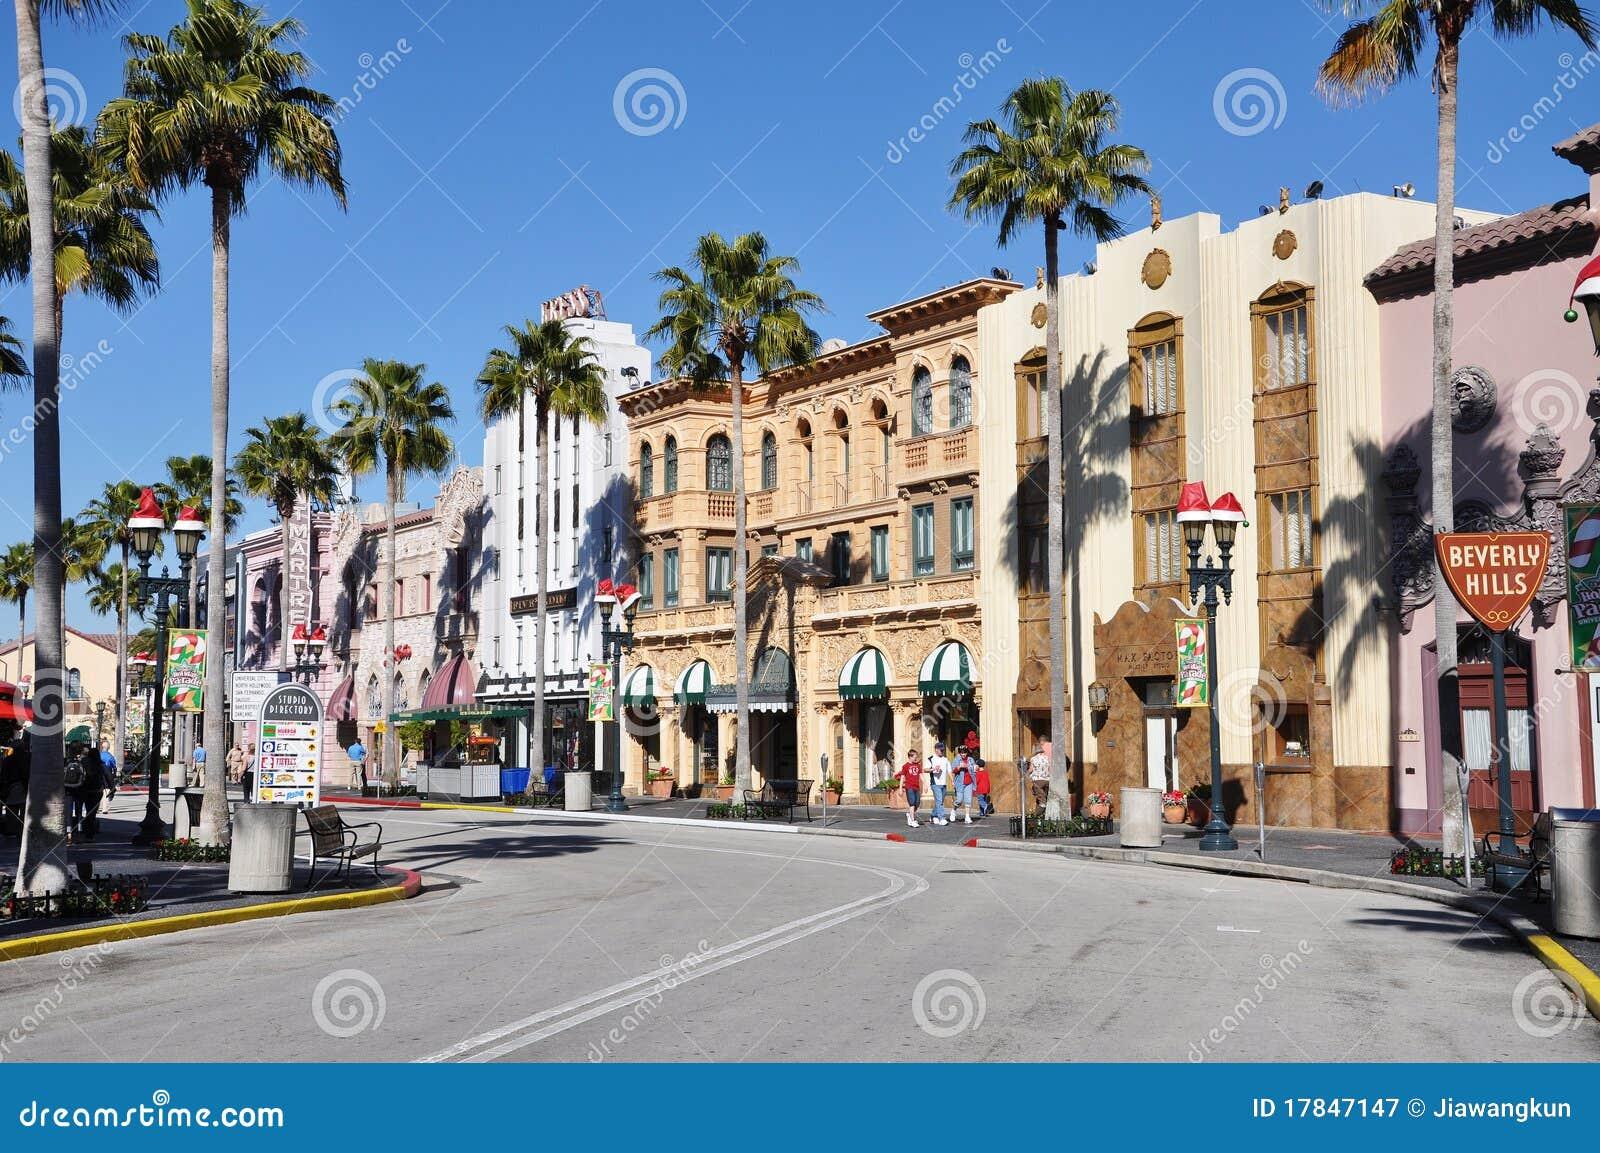 Hollywood Boulevard In Universal Orlando Editorial